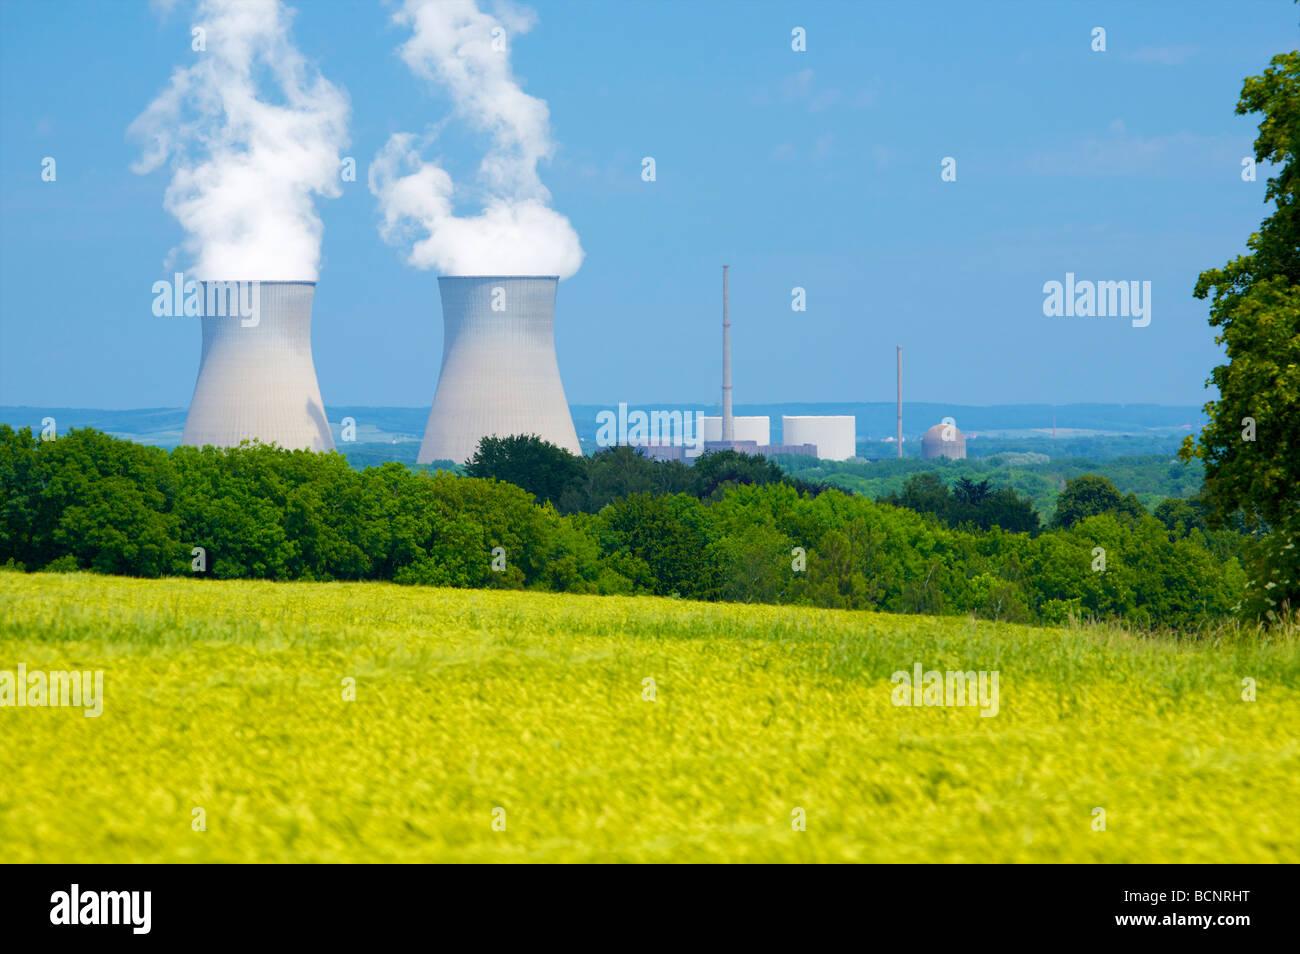 Gundremmingen nuclear power plant in Bavaria, Germany. 2 active BWR reactors. Kernkraftwerk Gundremmingen, Bayern, Stock Photo